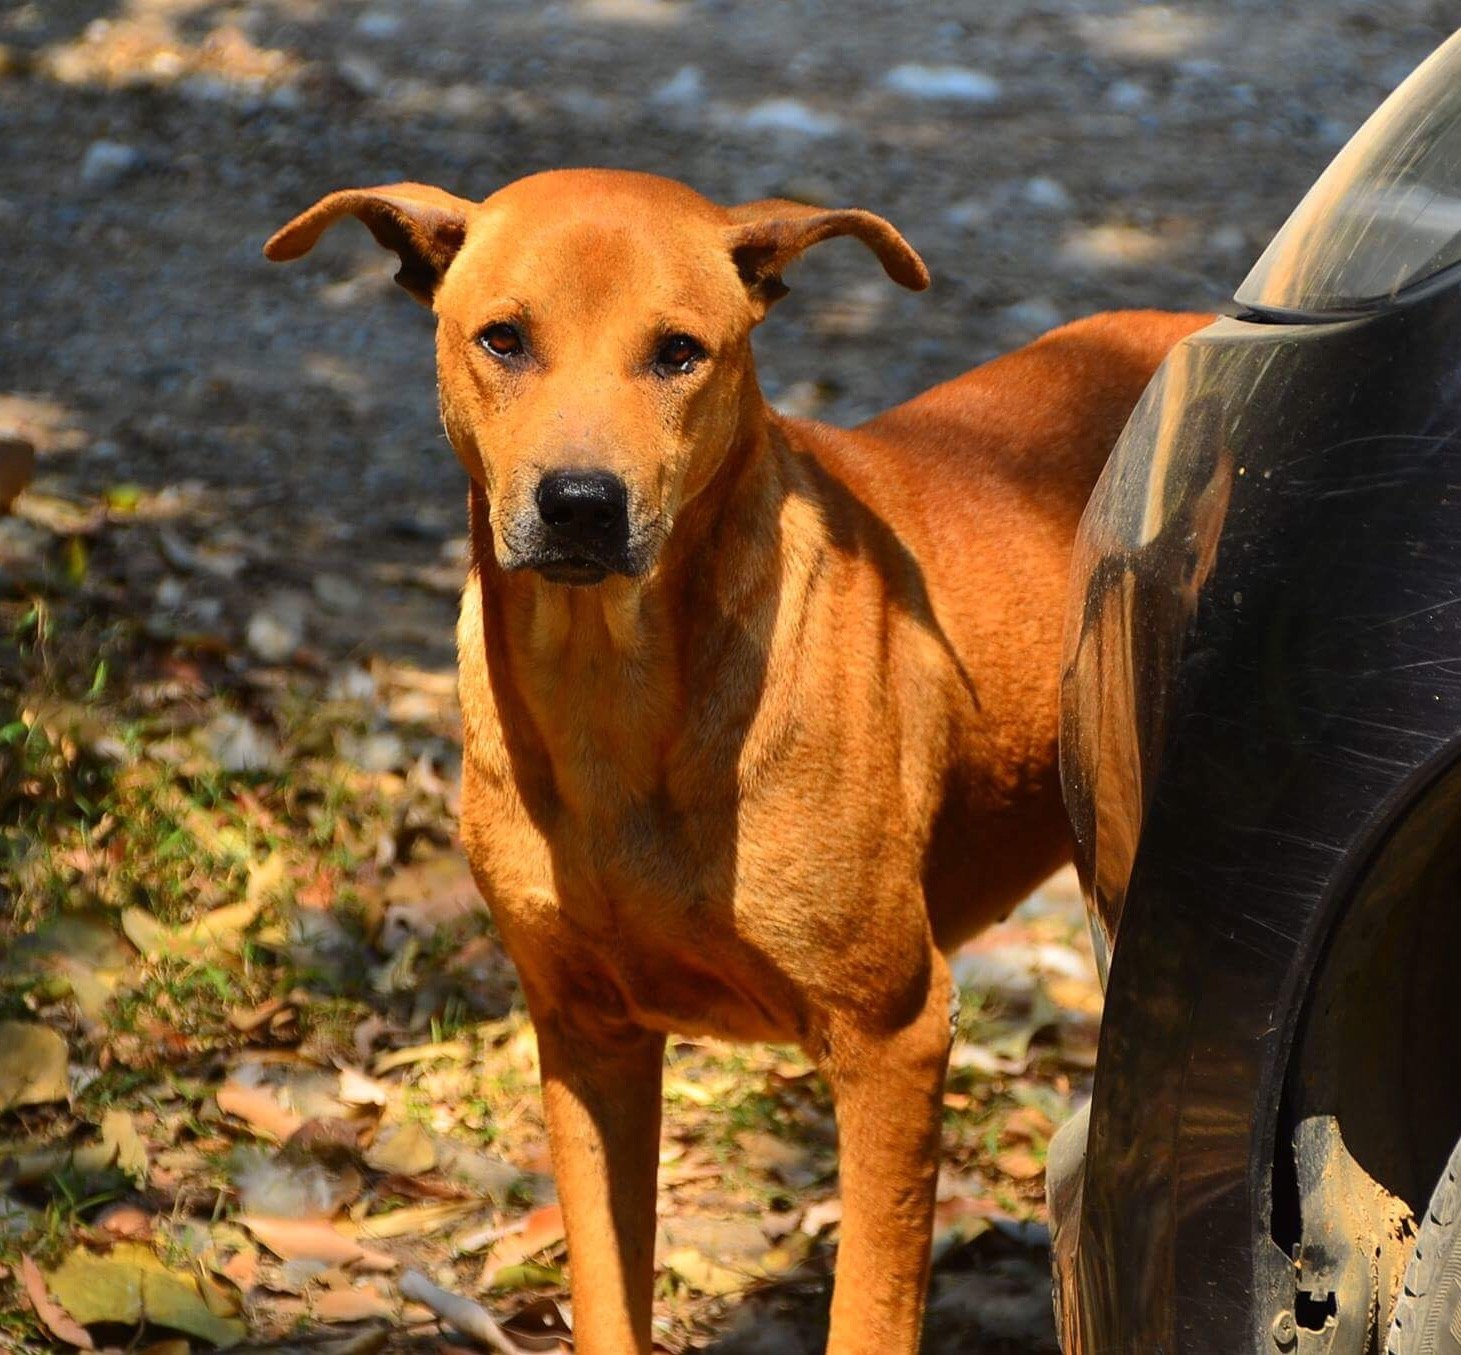 DOG TRACKER GPS    info please? - Plants, Pets & Vets in Thailand